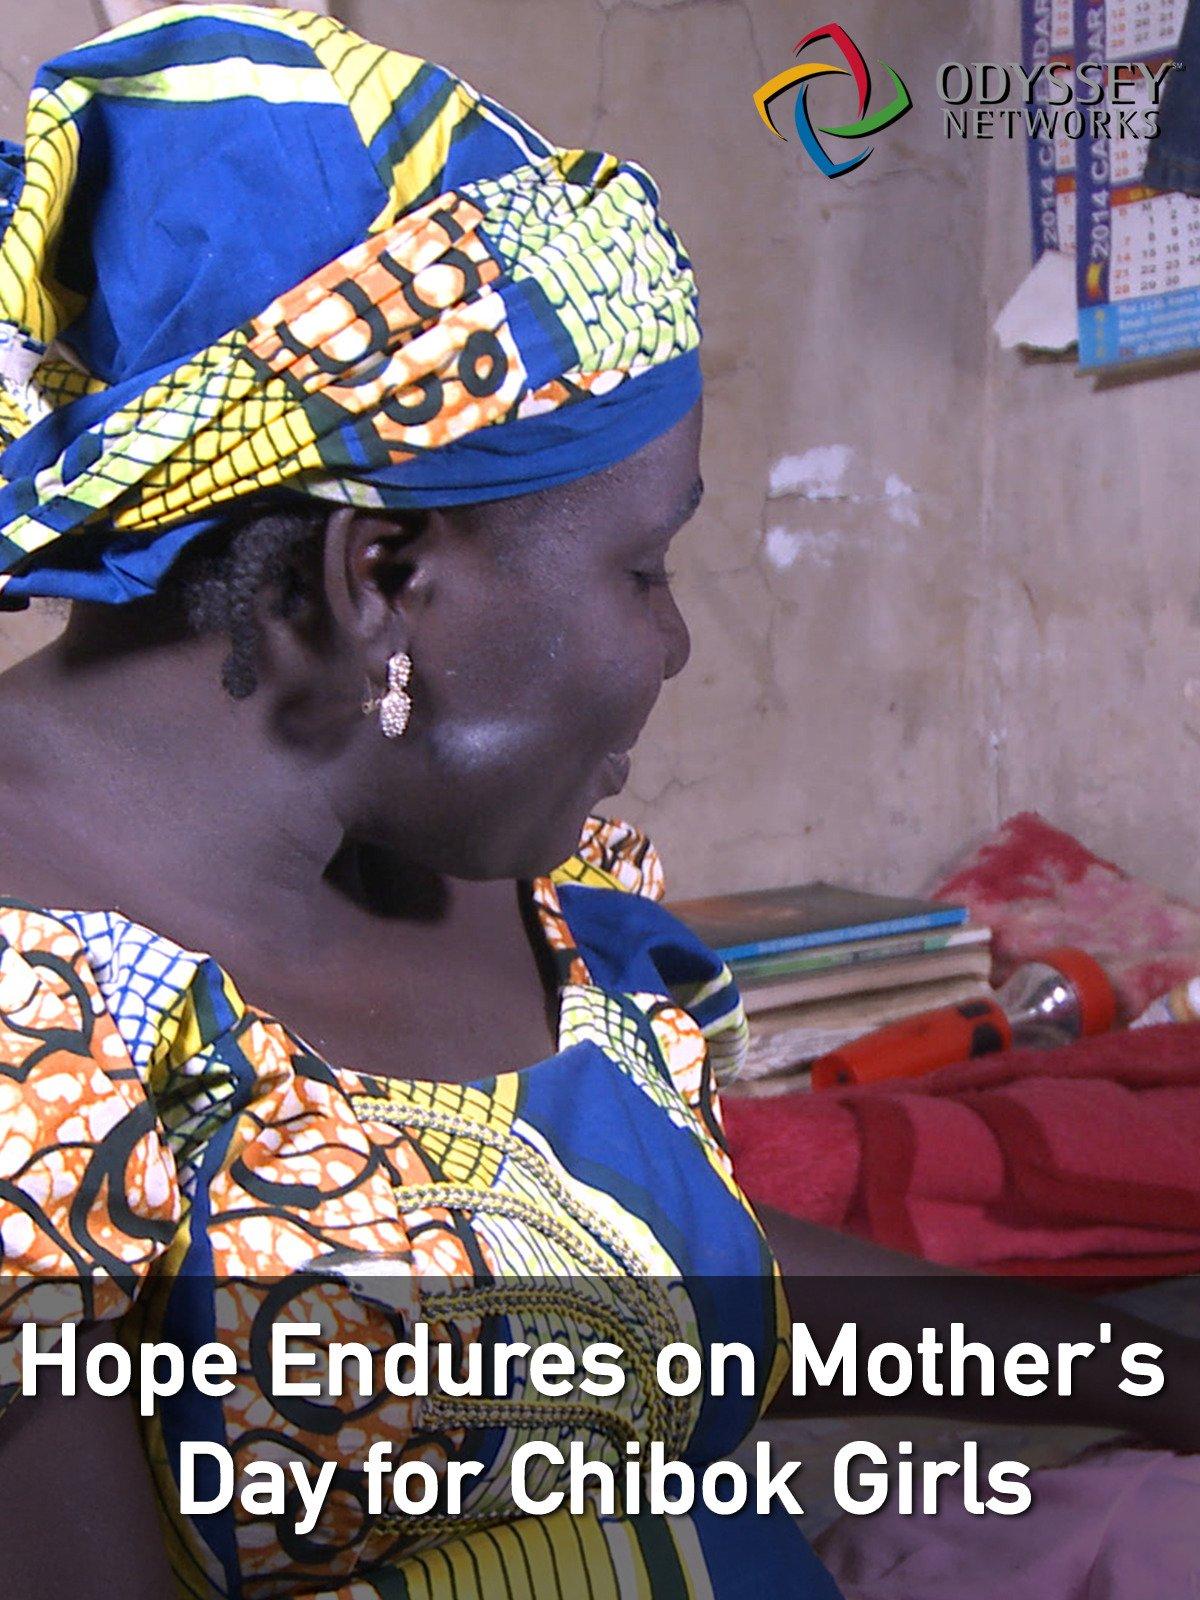 Clip: Hope Endures on Mother's Day for Chibok Girls